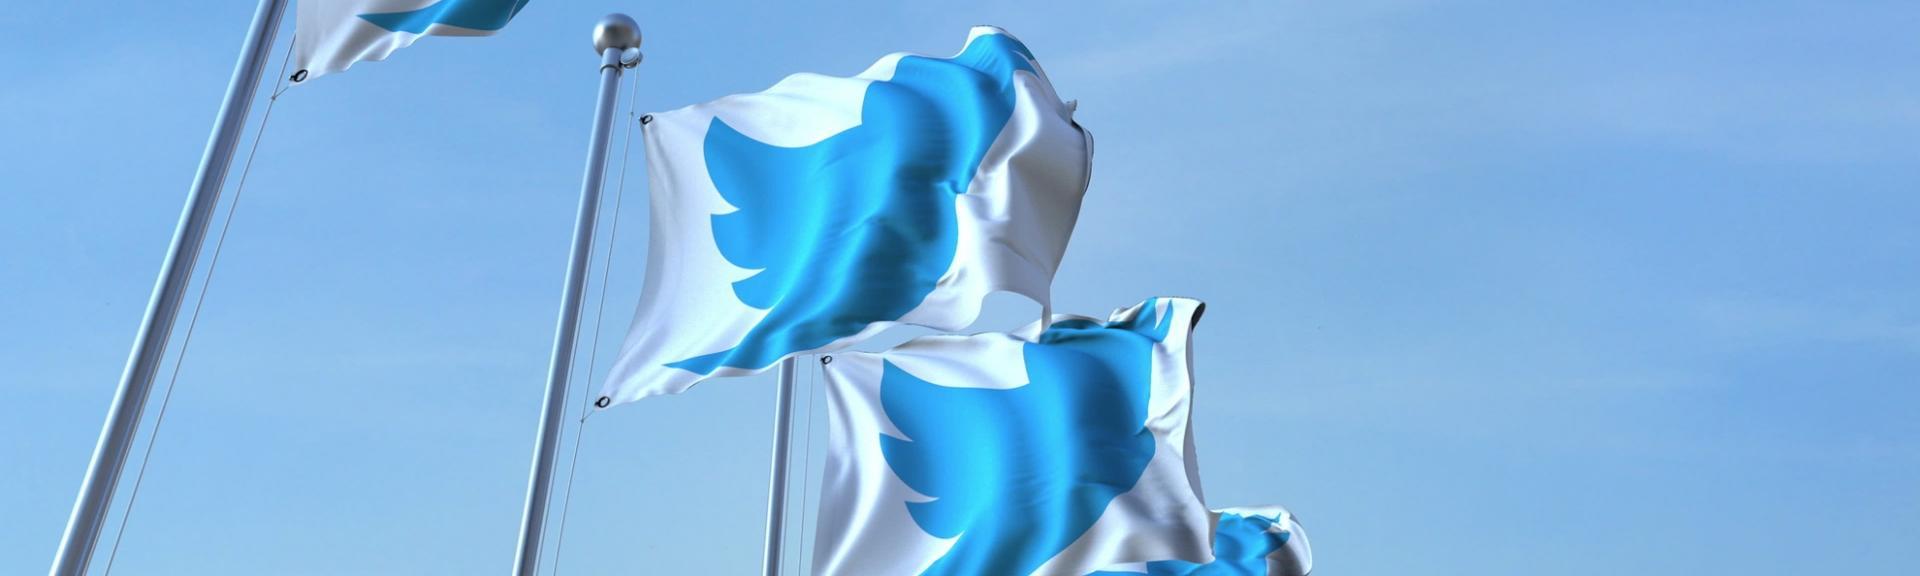 Inserzioni Twitter, i risultati saranno più trasparenti